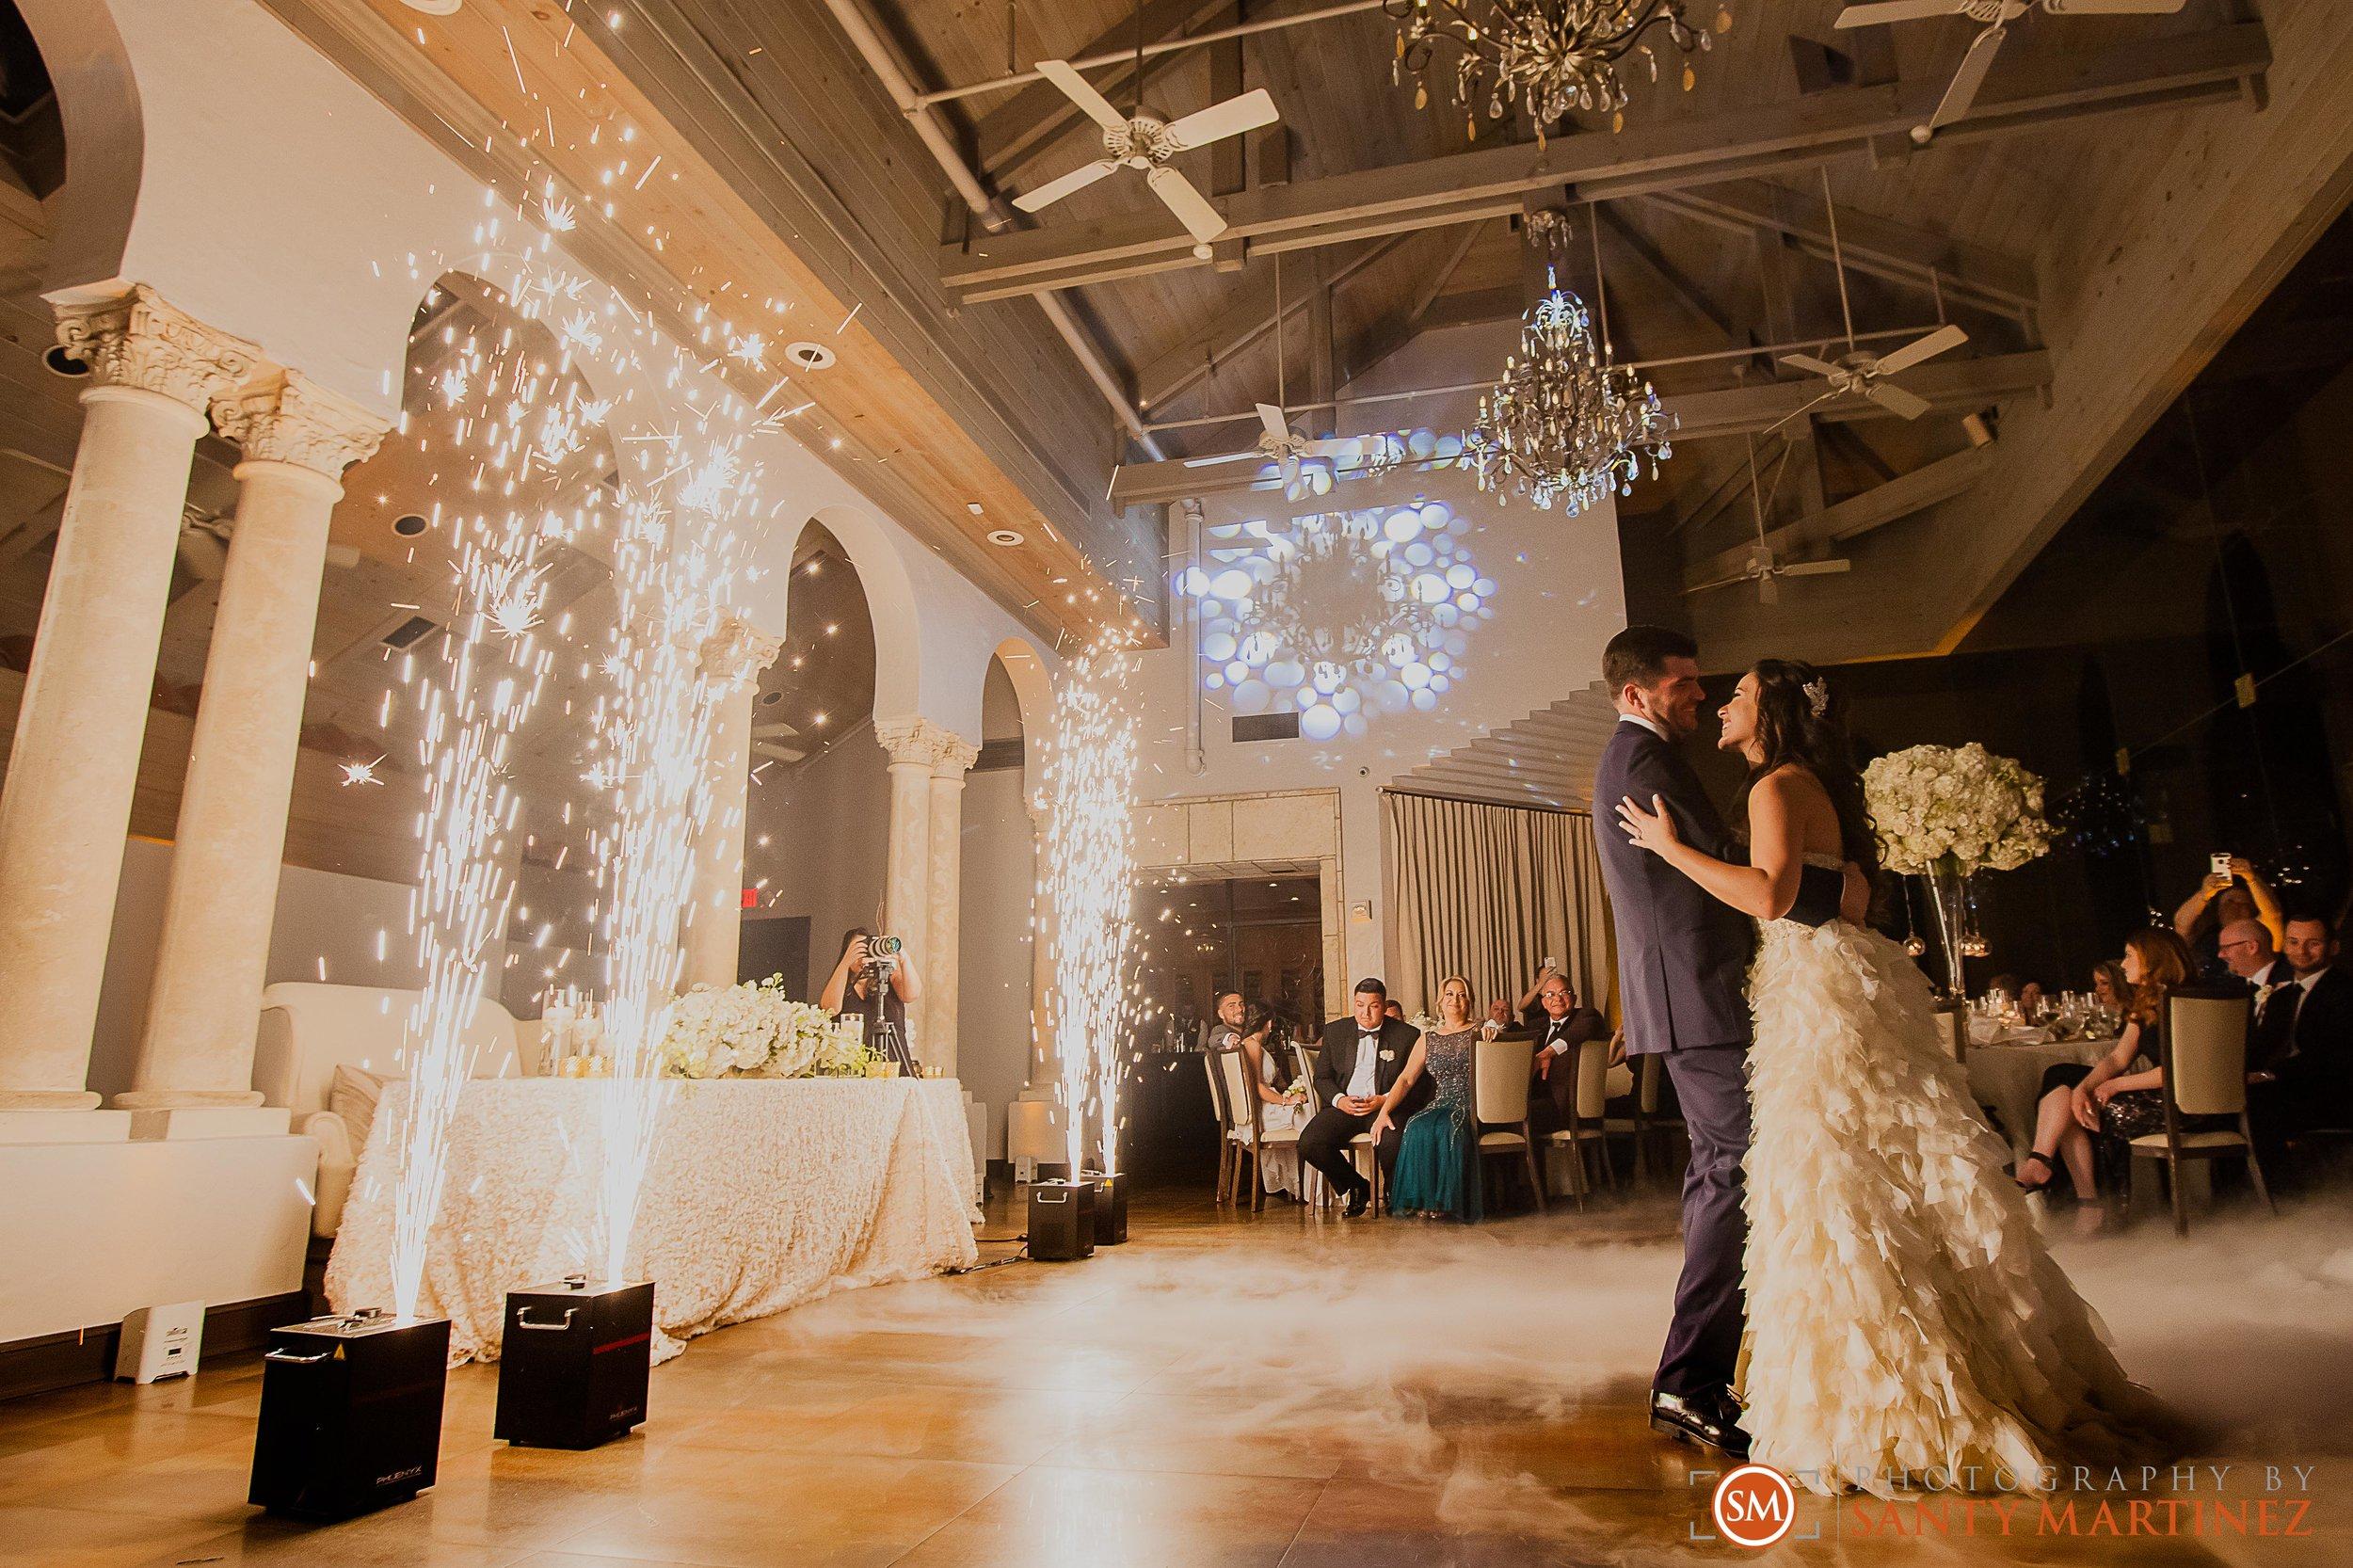 Wedding Coral Gables Country Club - Santy Martinez Photography-42.jpg